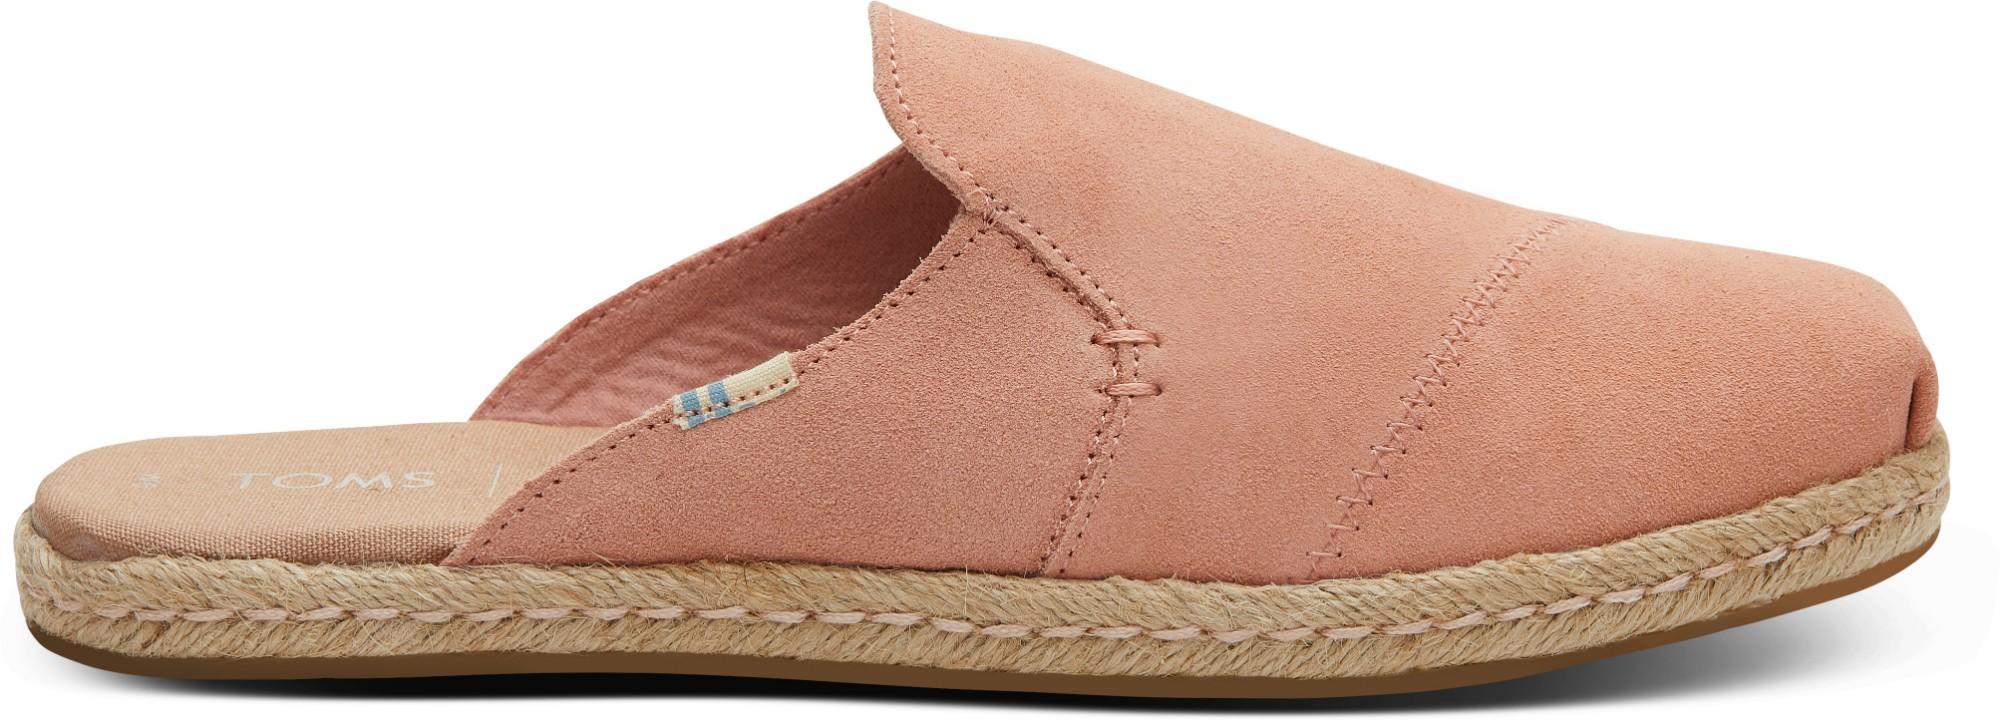 TOMS Suede Women's Nova Coral Pink 36,5